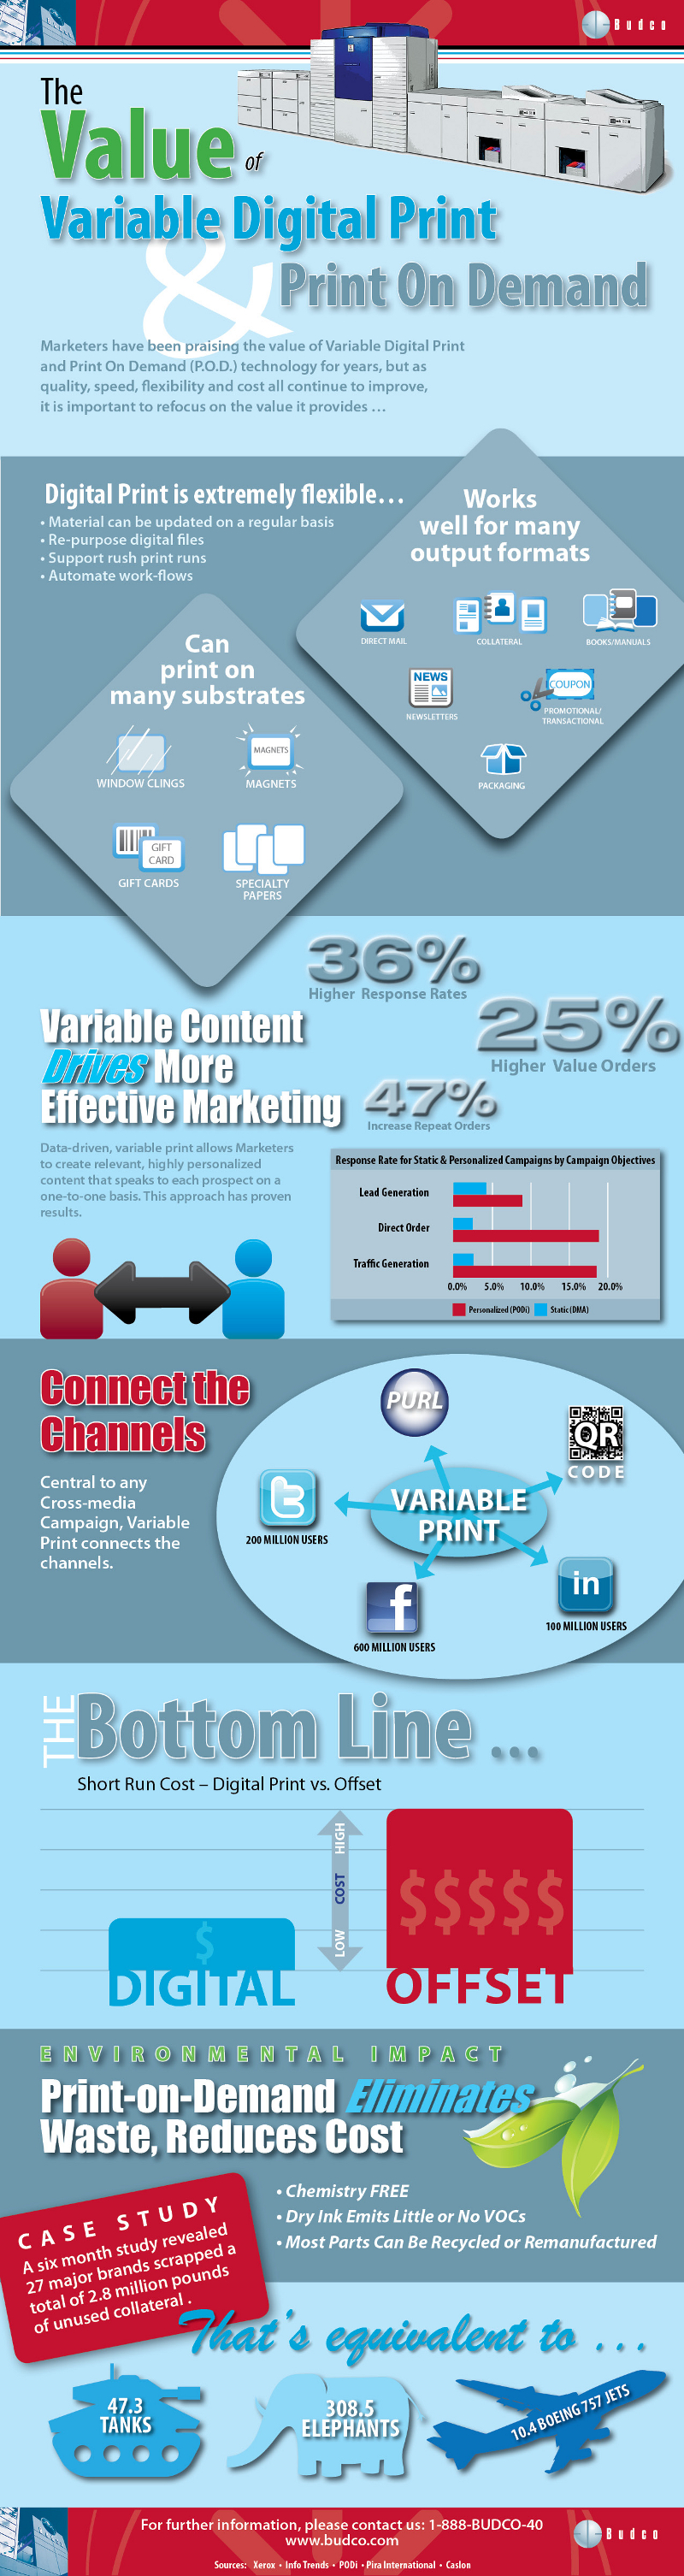 Benefits of Variable Digital Print